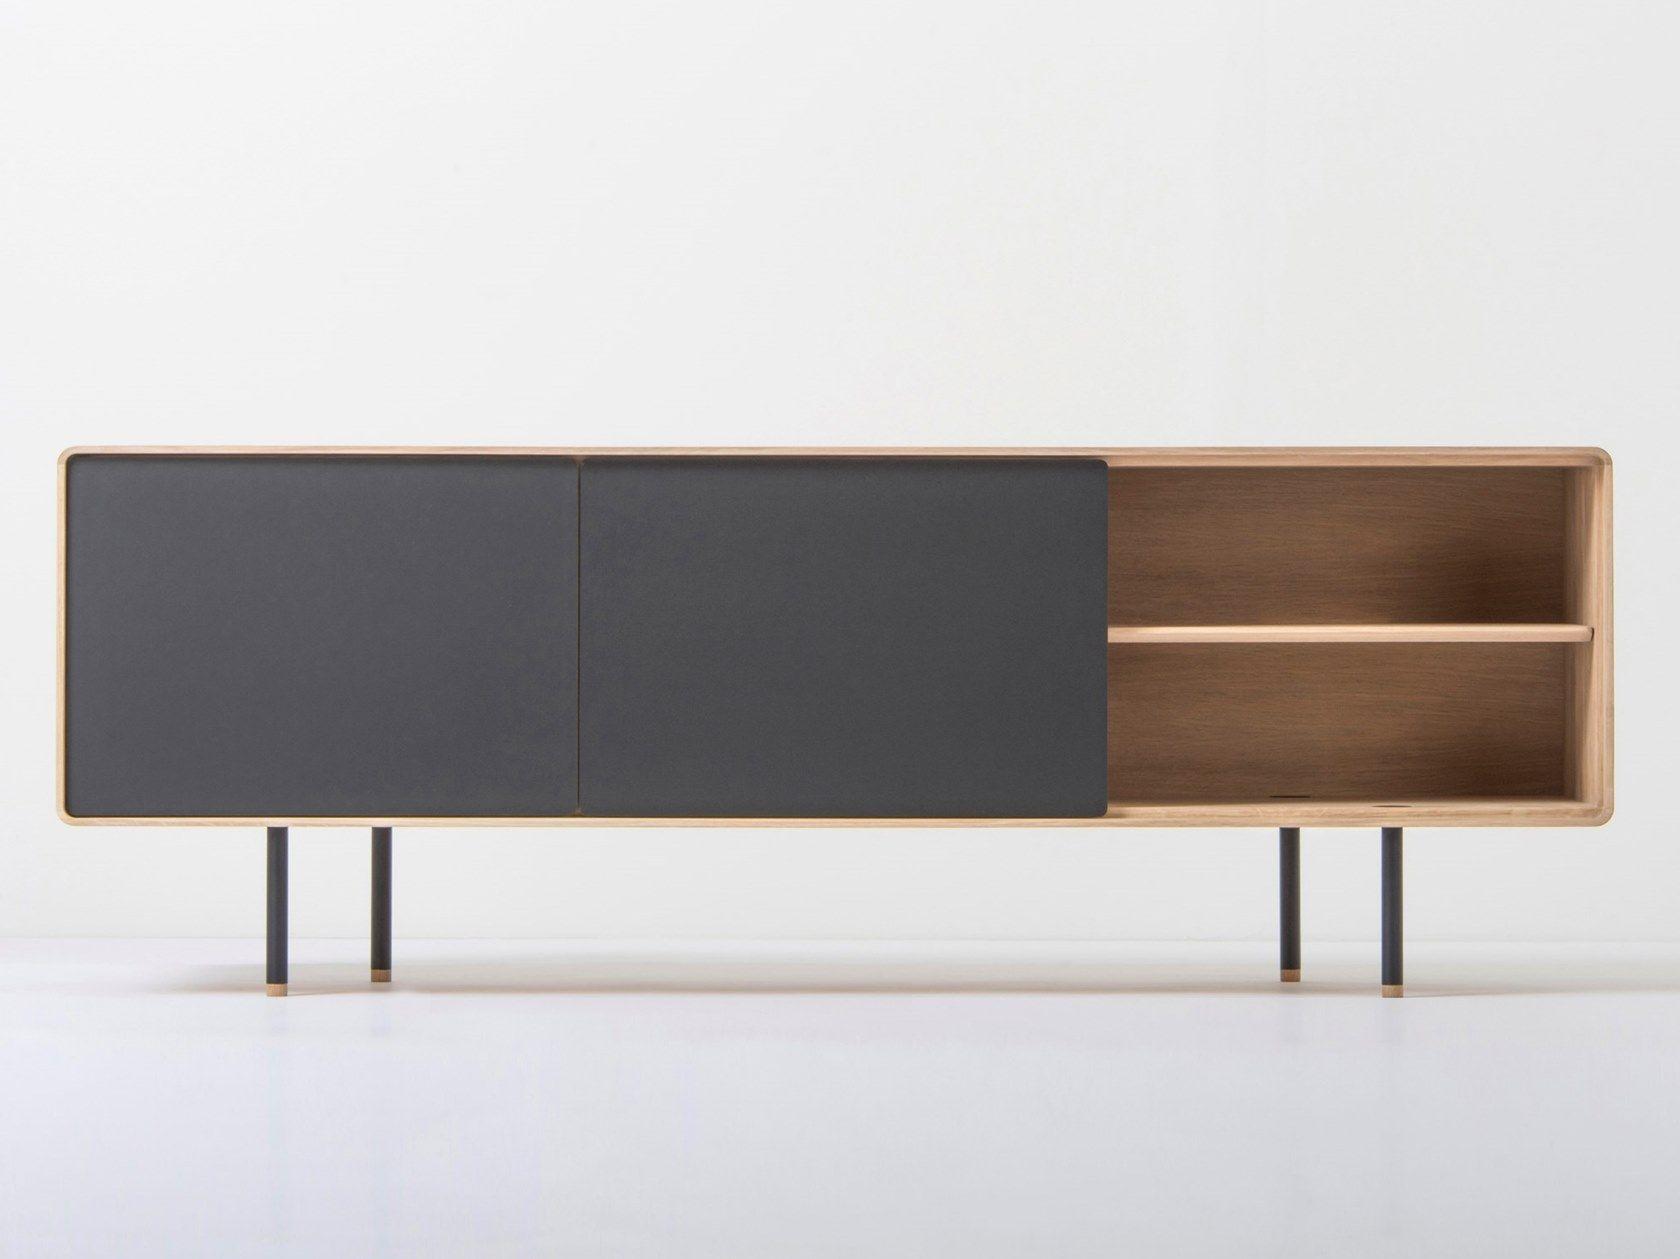 Wooden Tv Cabinet Sideboard Fina Tv Cabinet By Gazzda Tv